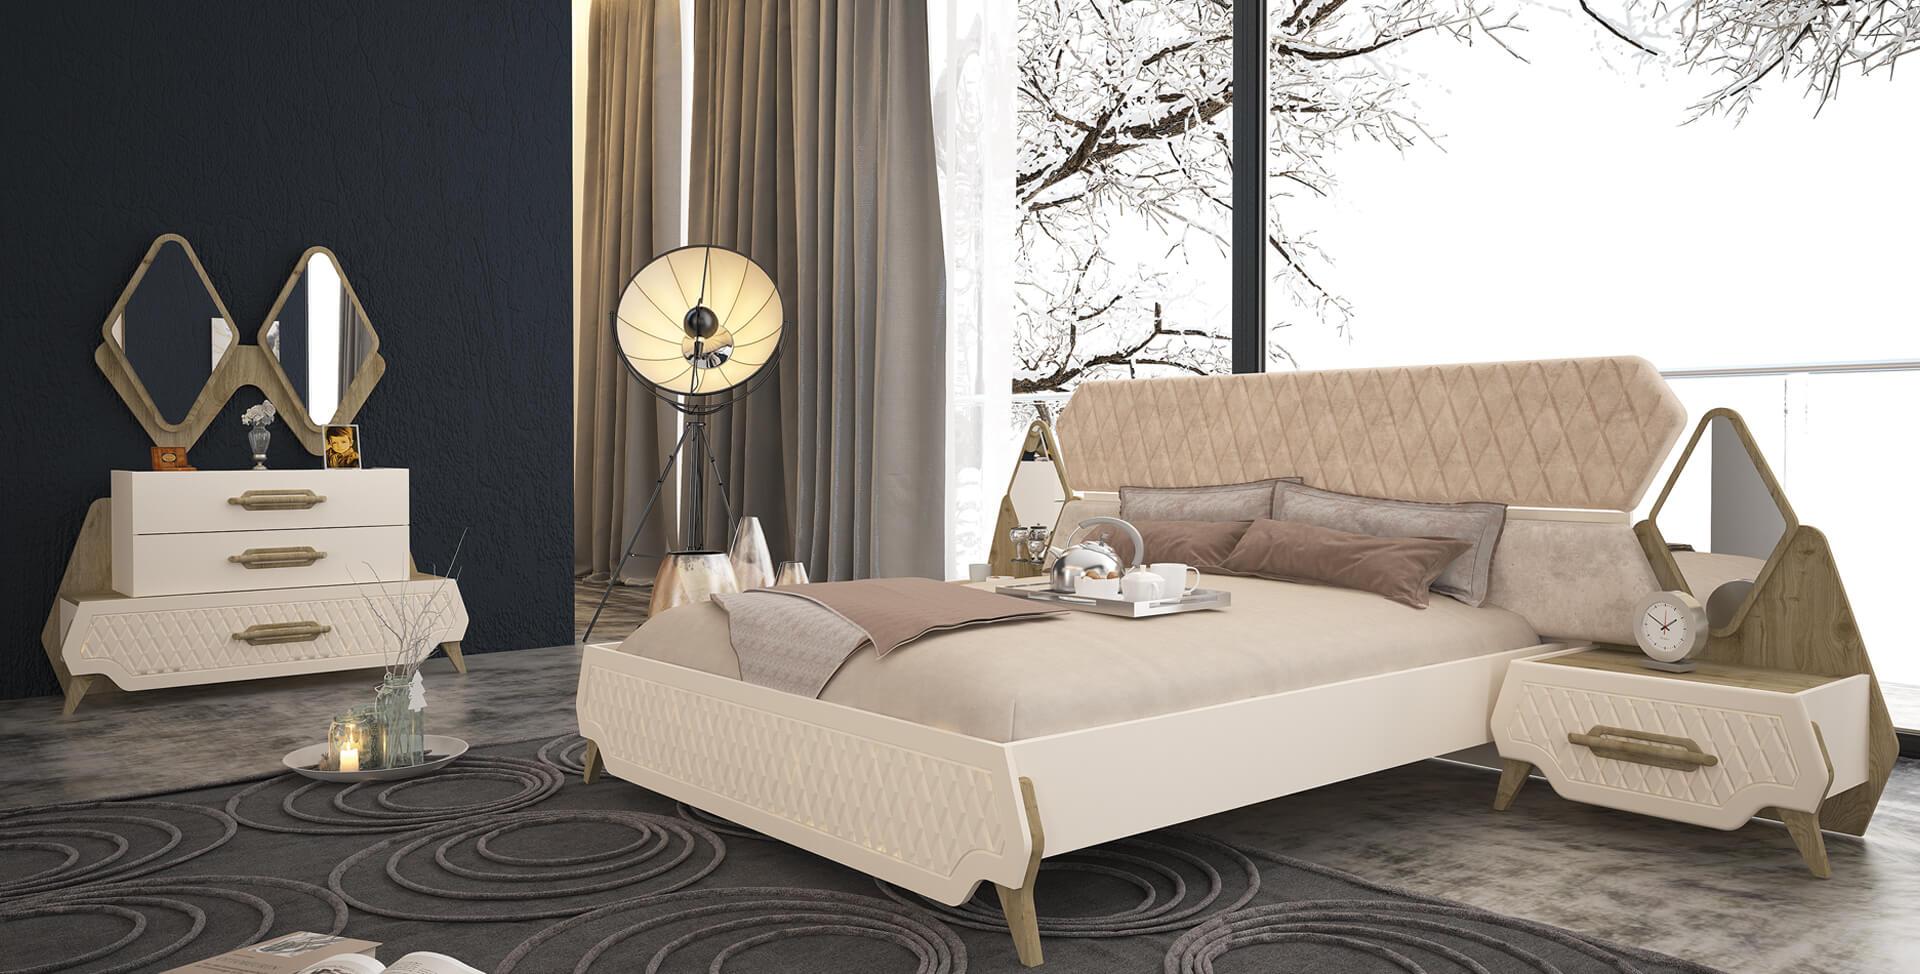 Roma Schlafzimmer Komplett Set